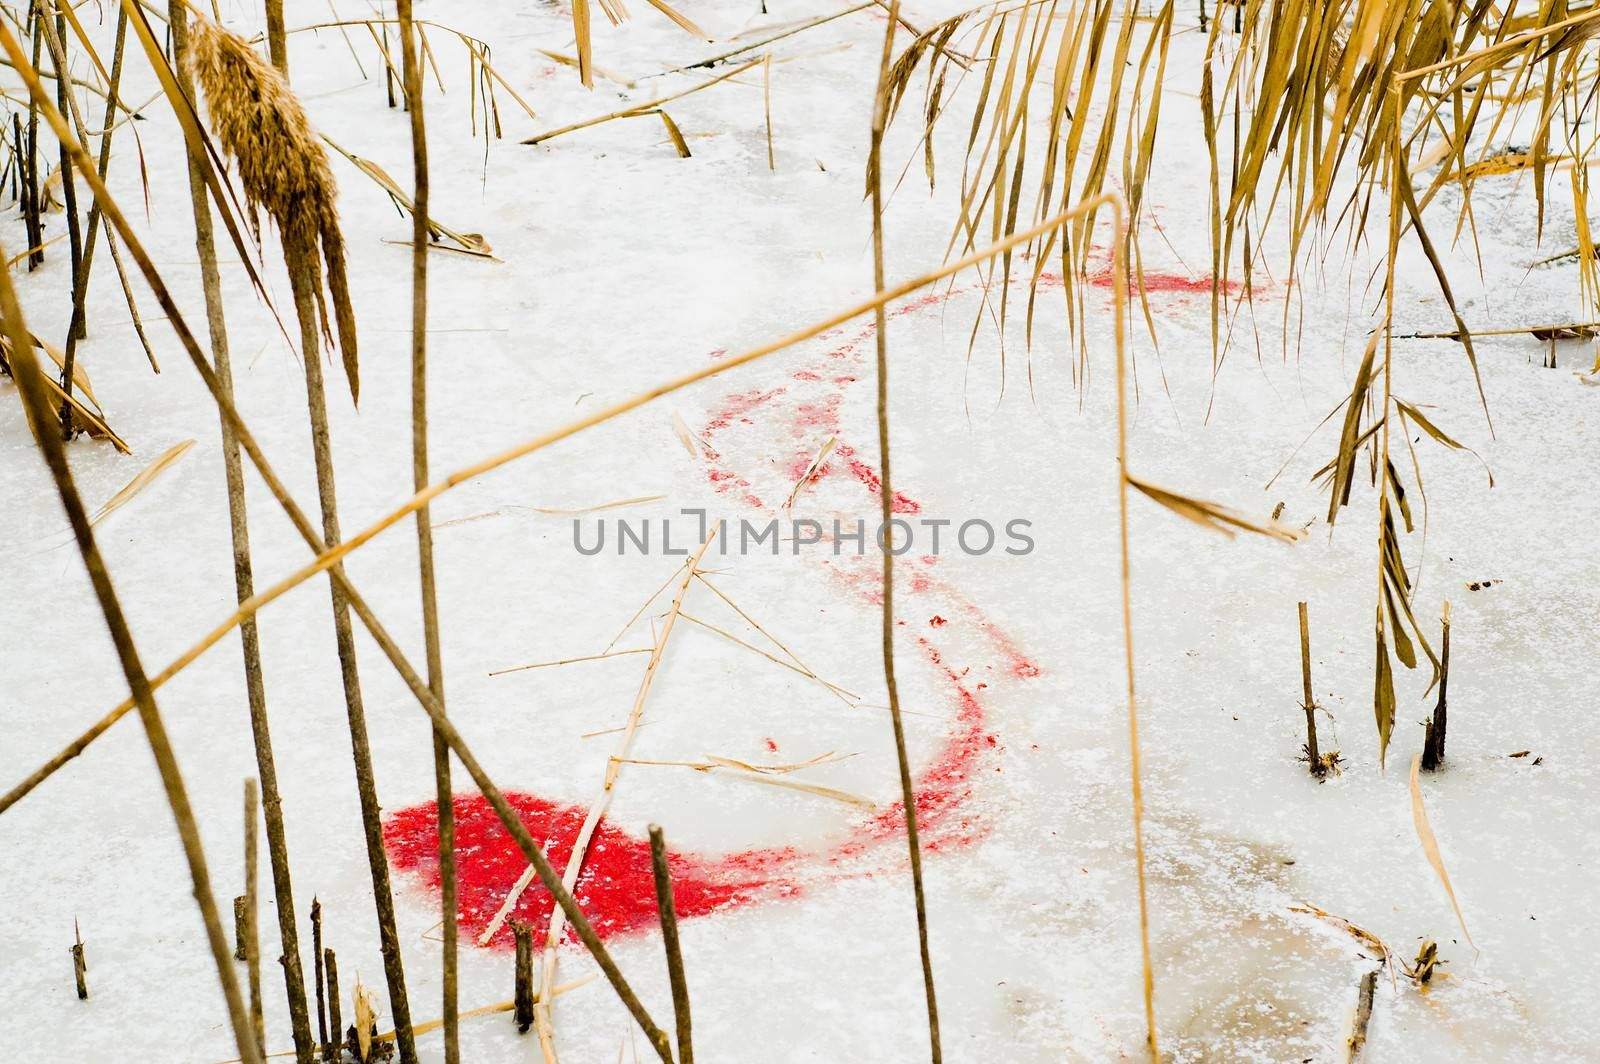 animals blood over snow